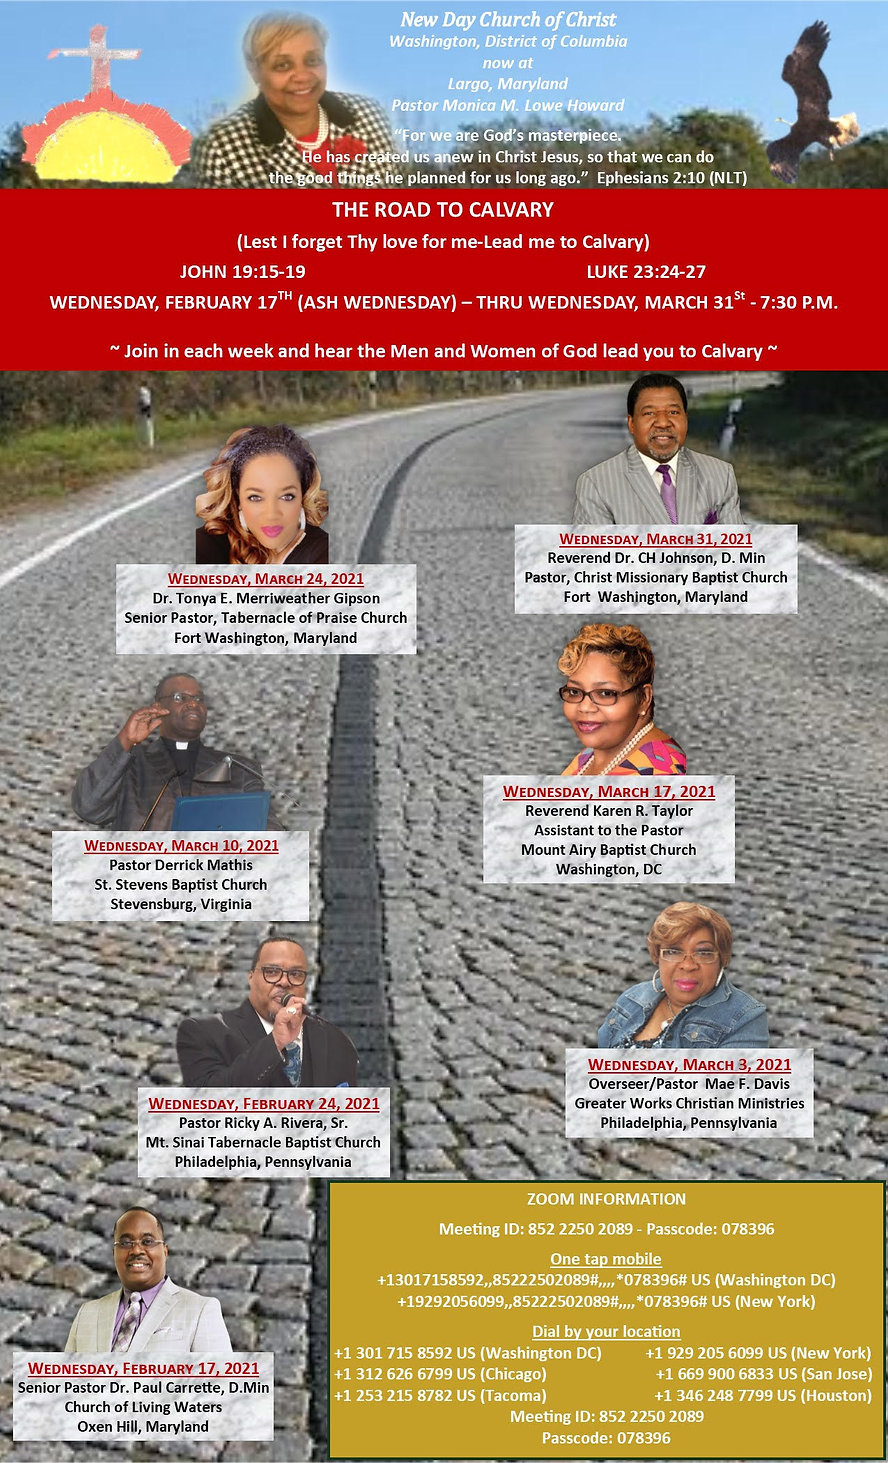 The road to calvary.jpg